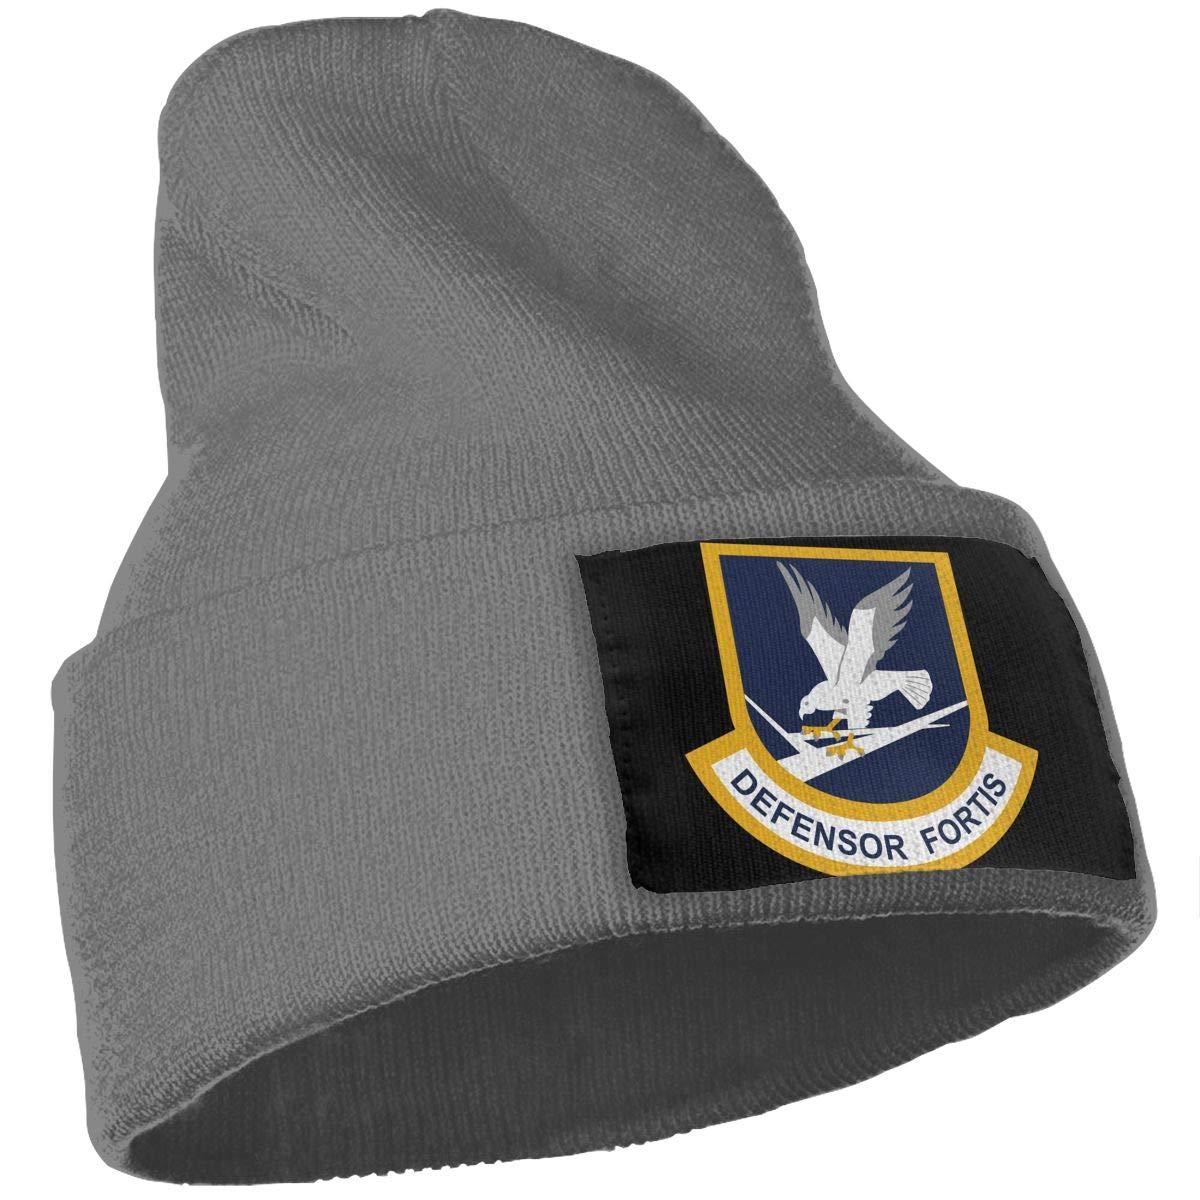 QZqDQ Defensor Fortis Unisex Fashion Knitted Hat Luxury Hip-Hop Cap